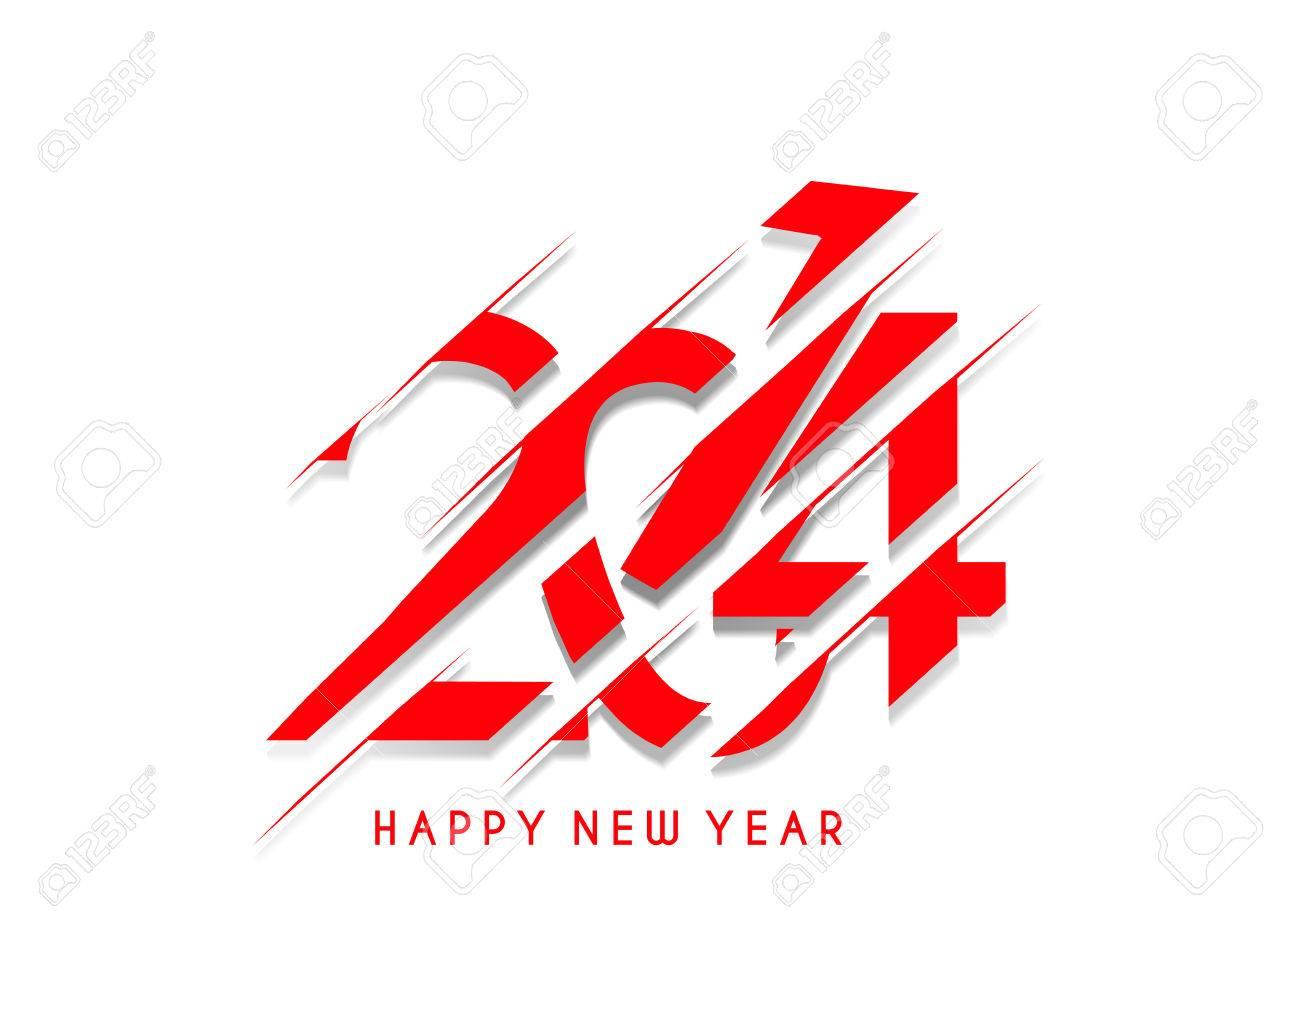 Happy New Year 2014 Text Design Stock Vector - 24052214